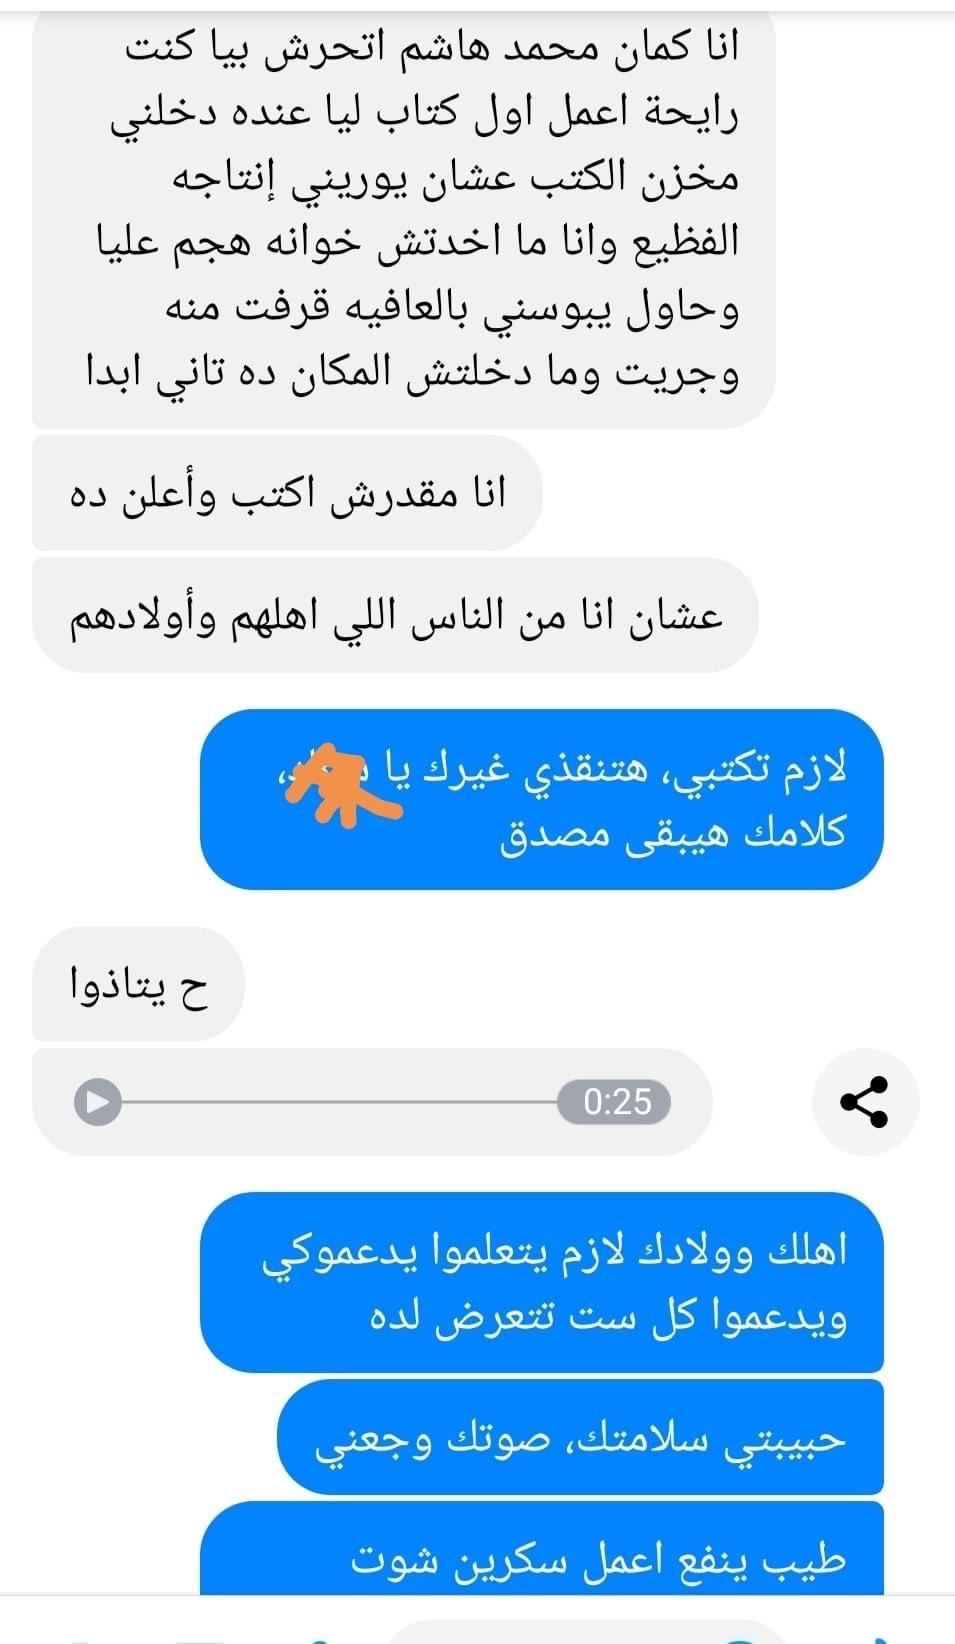 WhatsApp Image 2020-07-11 at 5.23.02 PM (1)